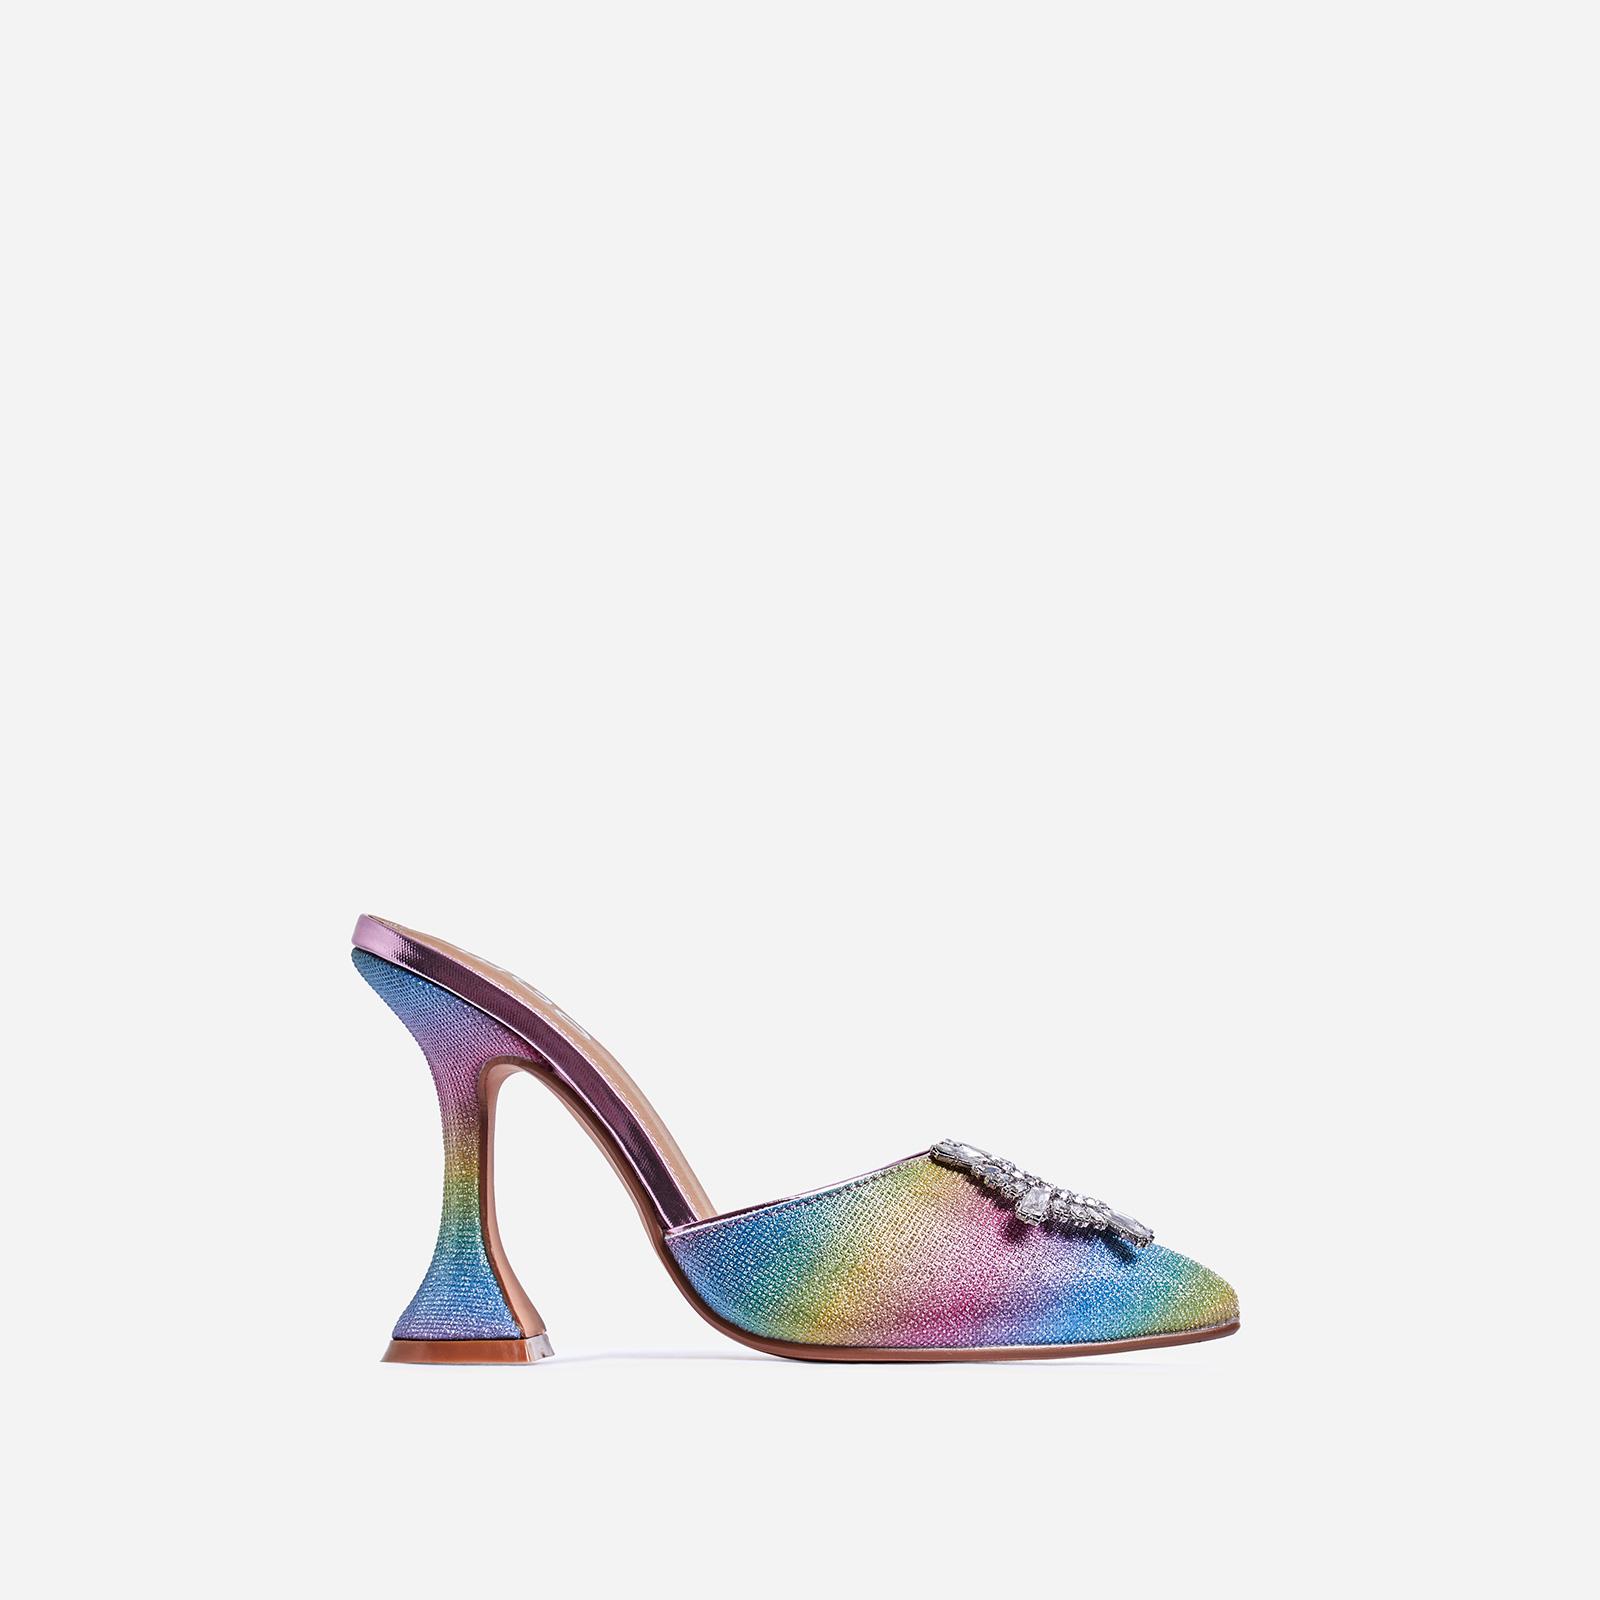 Moonlight Diamante Detail Pyramid Heel Mule In Rainbow Print Glitter